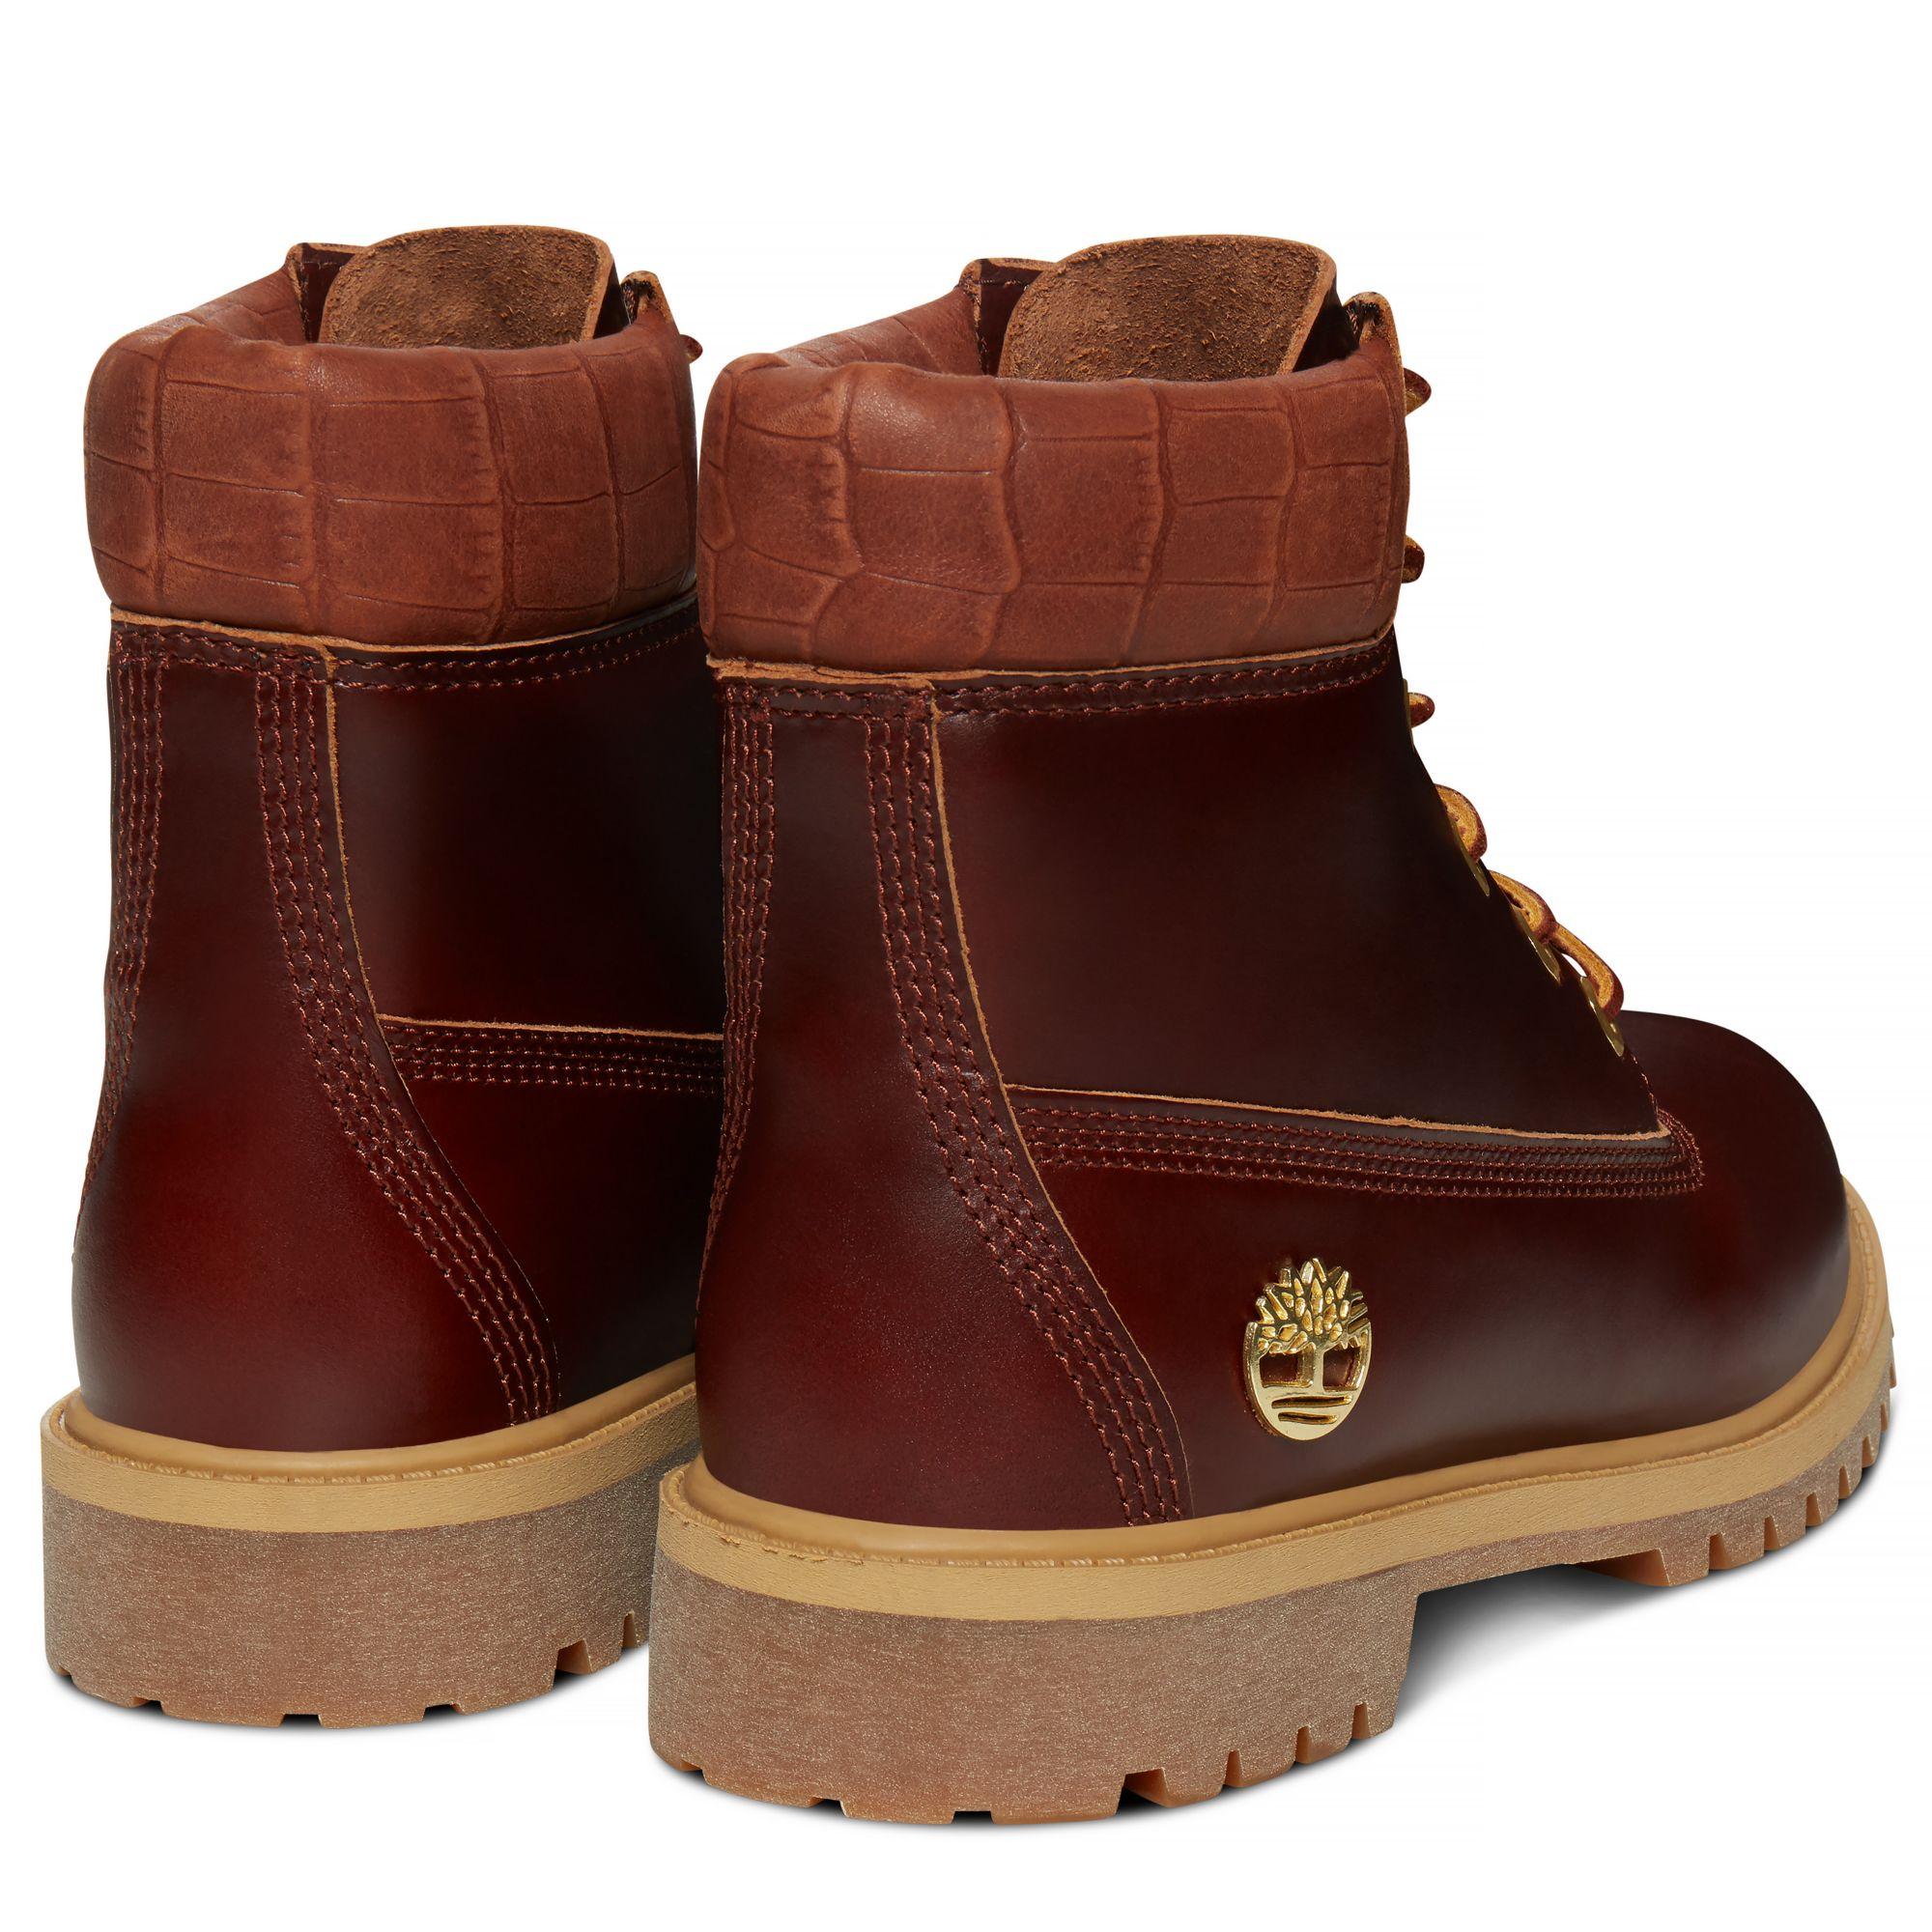 Timberland Junior 6 Inch Boot Dark Brown Reptile At 120 Love The Trumph Phantom Boots Darkbrown 5